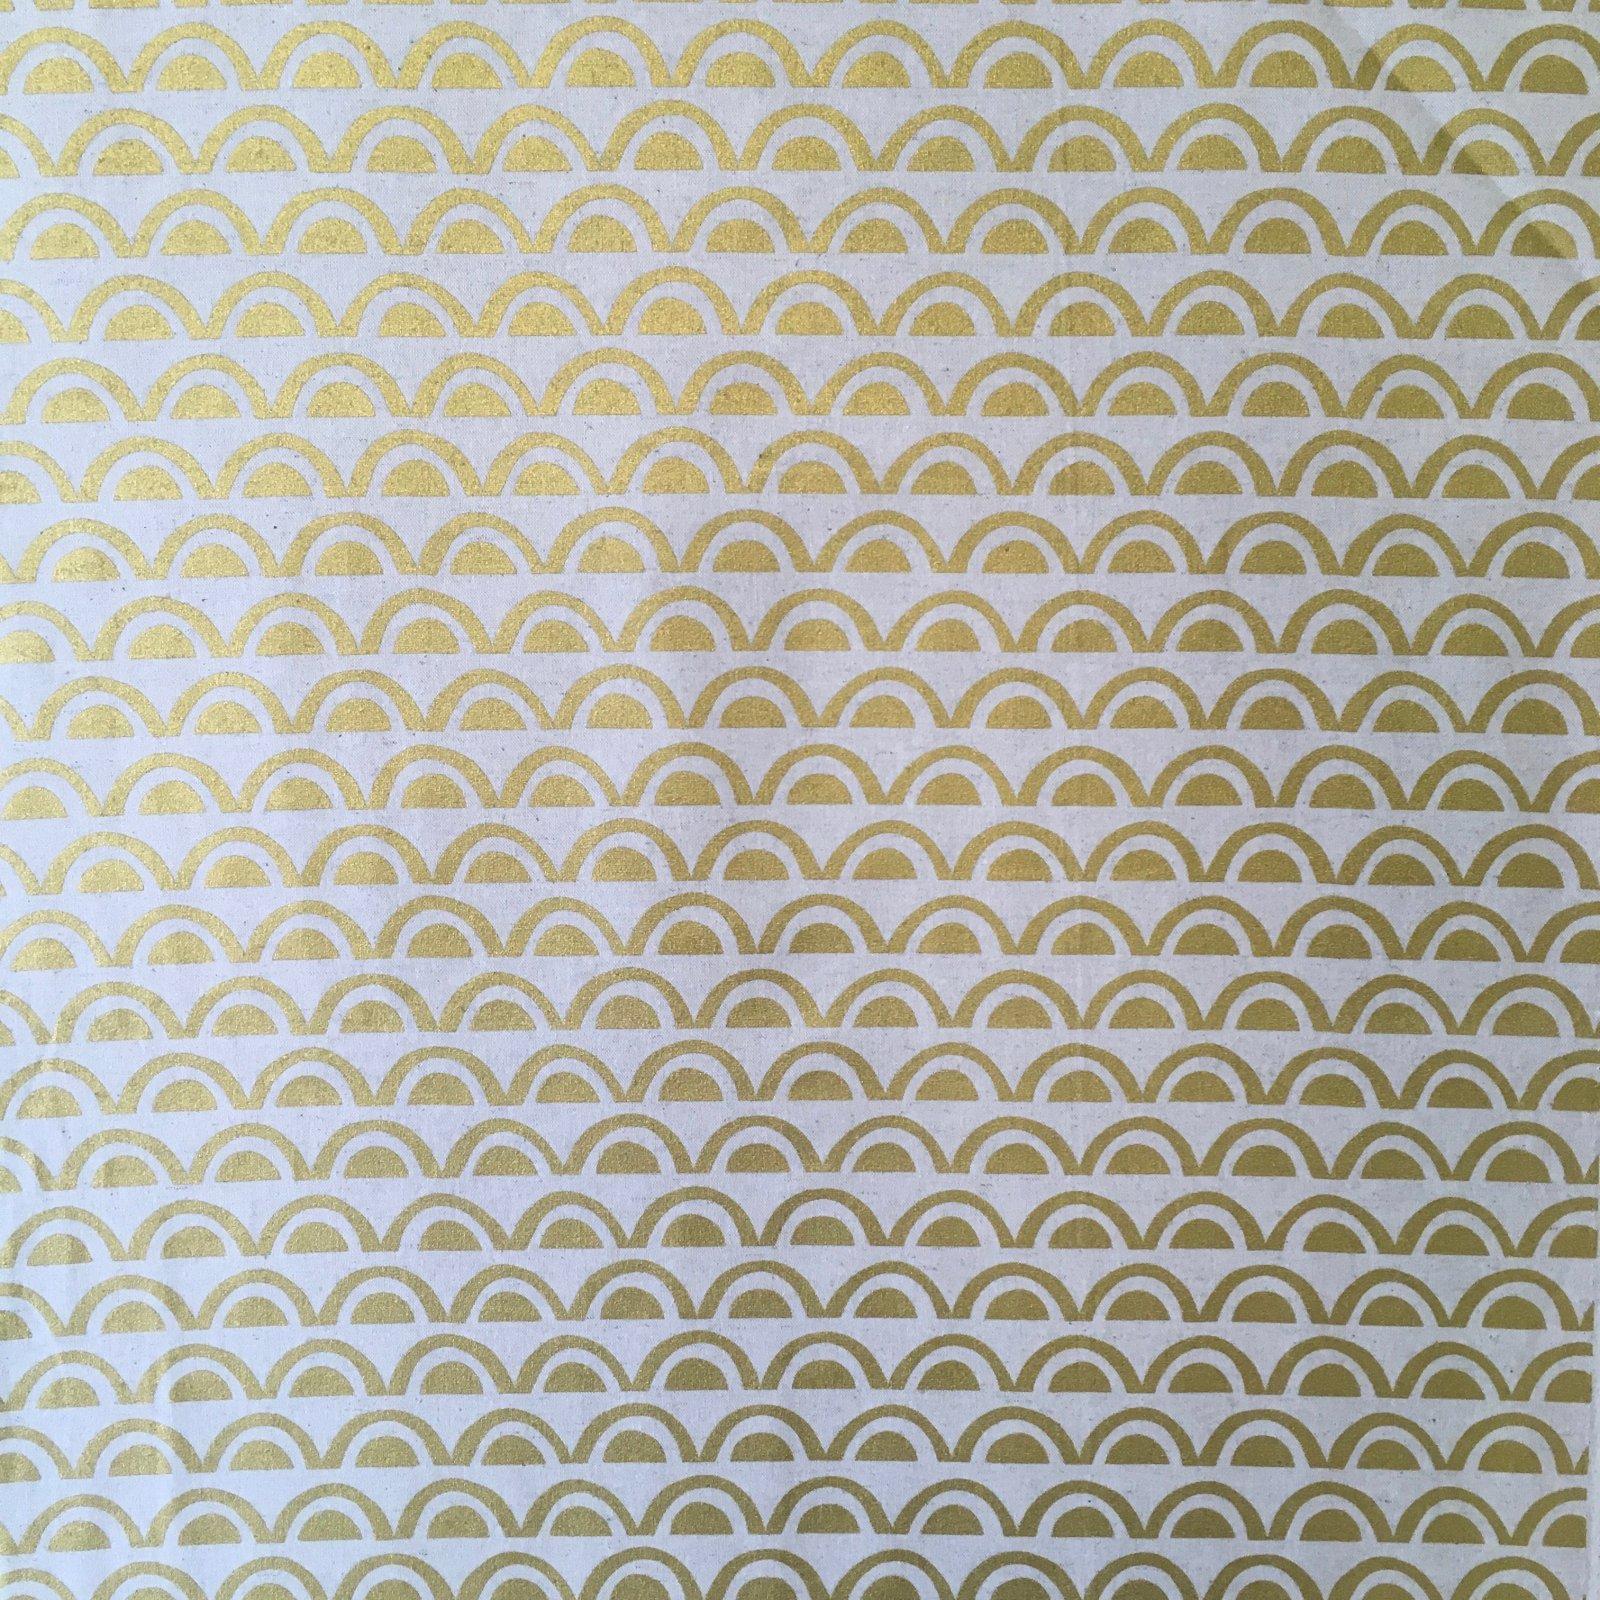 Ellen Baker Paper - Bridges (Gold)